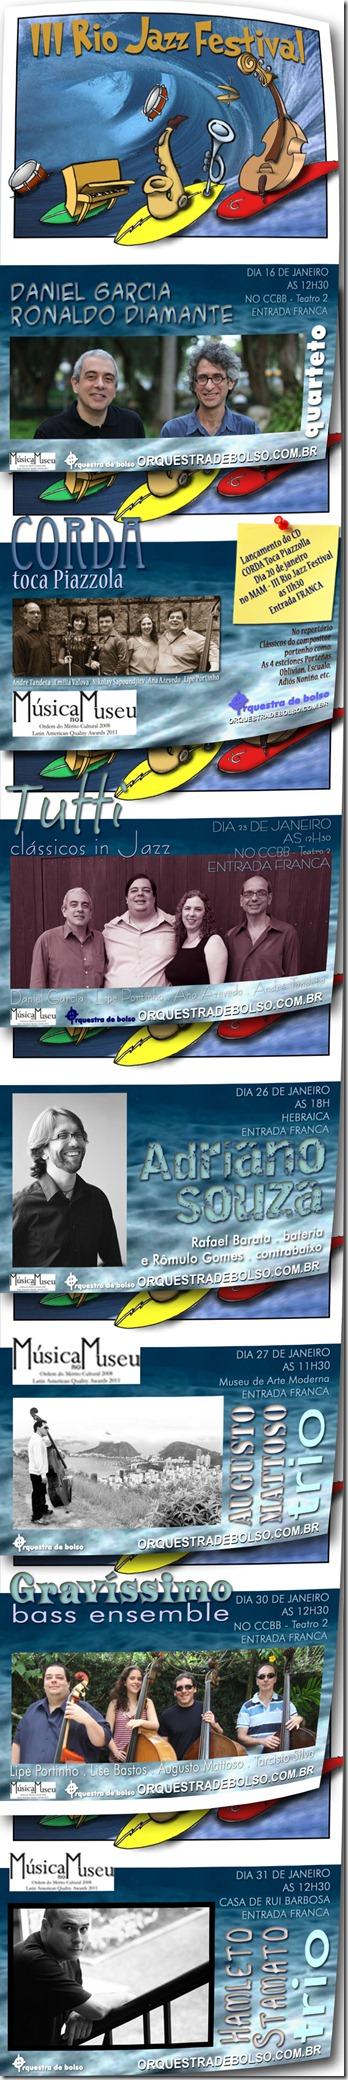 o III Rio Jazz Festival